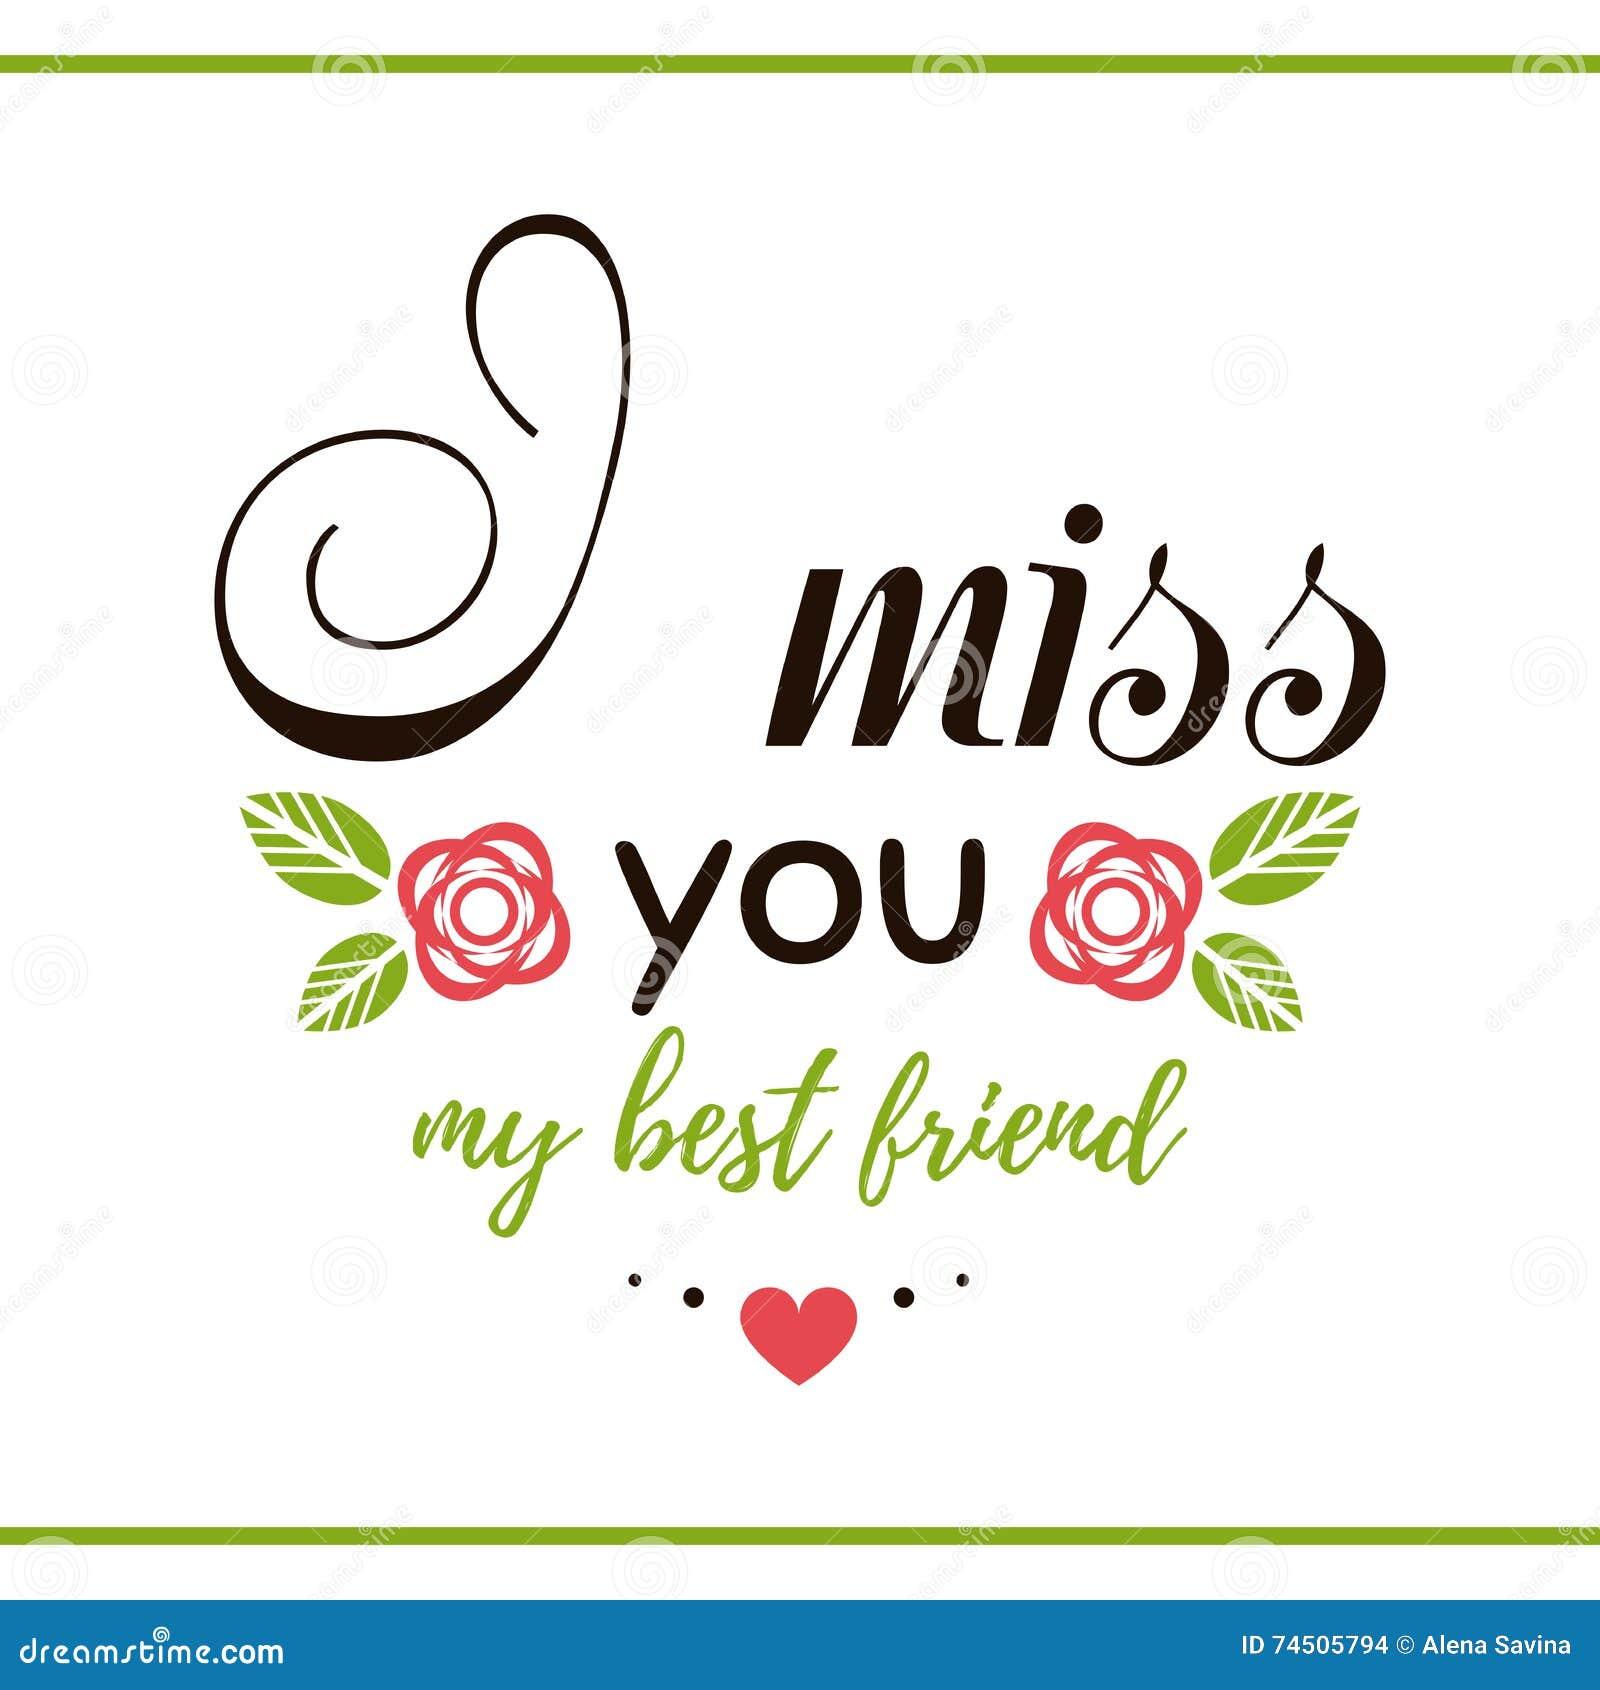 Miss U Friend Images - impremedia.net